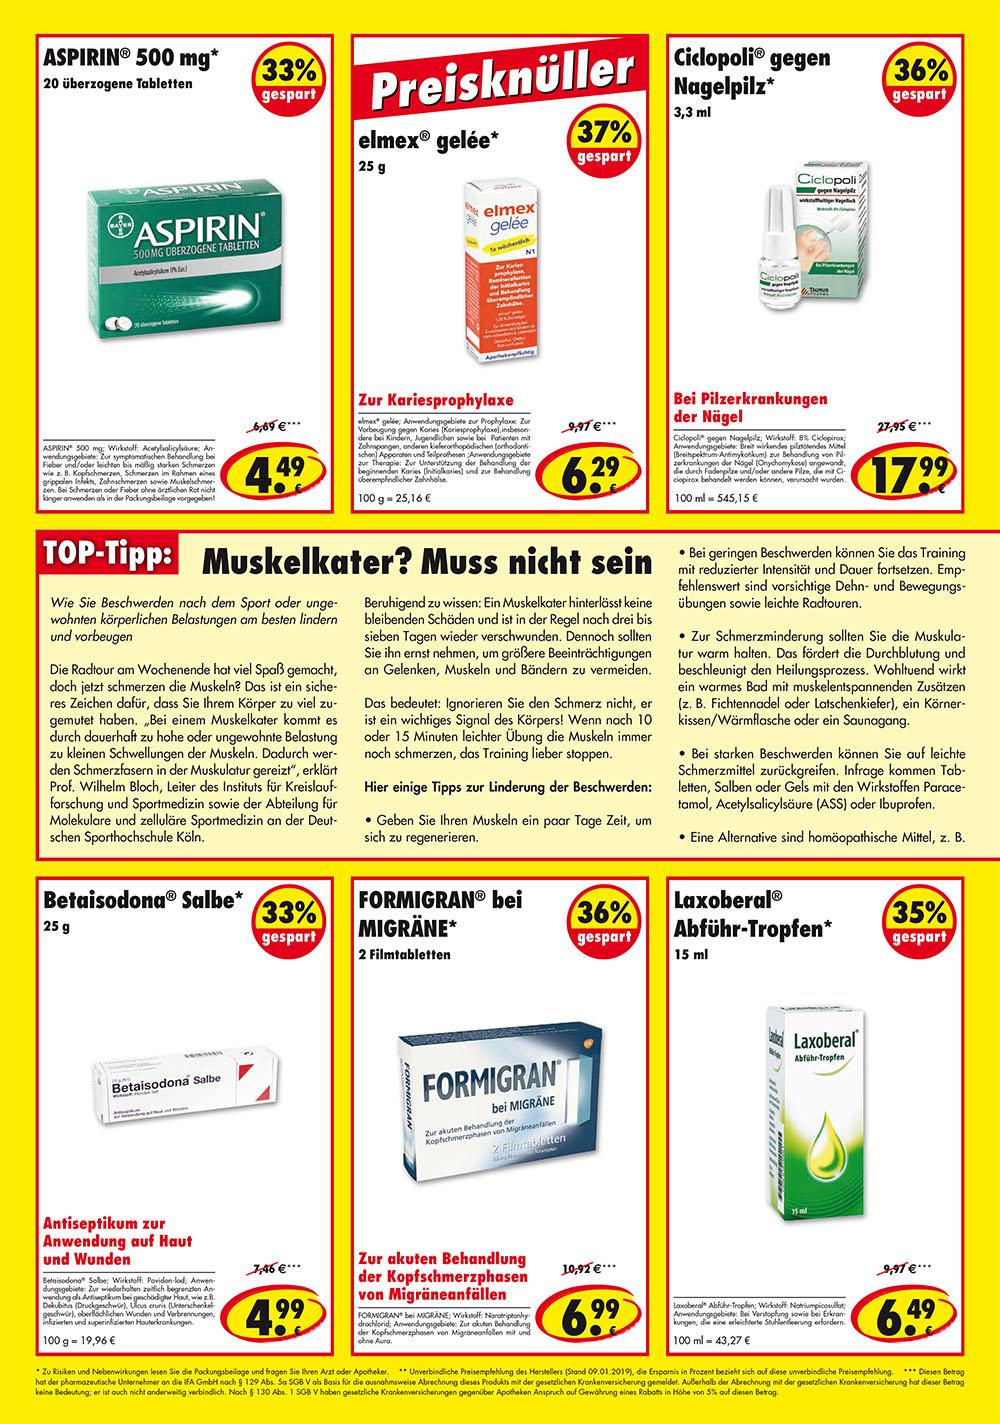 http://www.apotheken.de/fileadmin/clubarea/00000-Angebote/47447_13605_ahorn_angebot_2.jpg